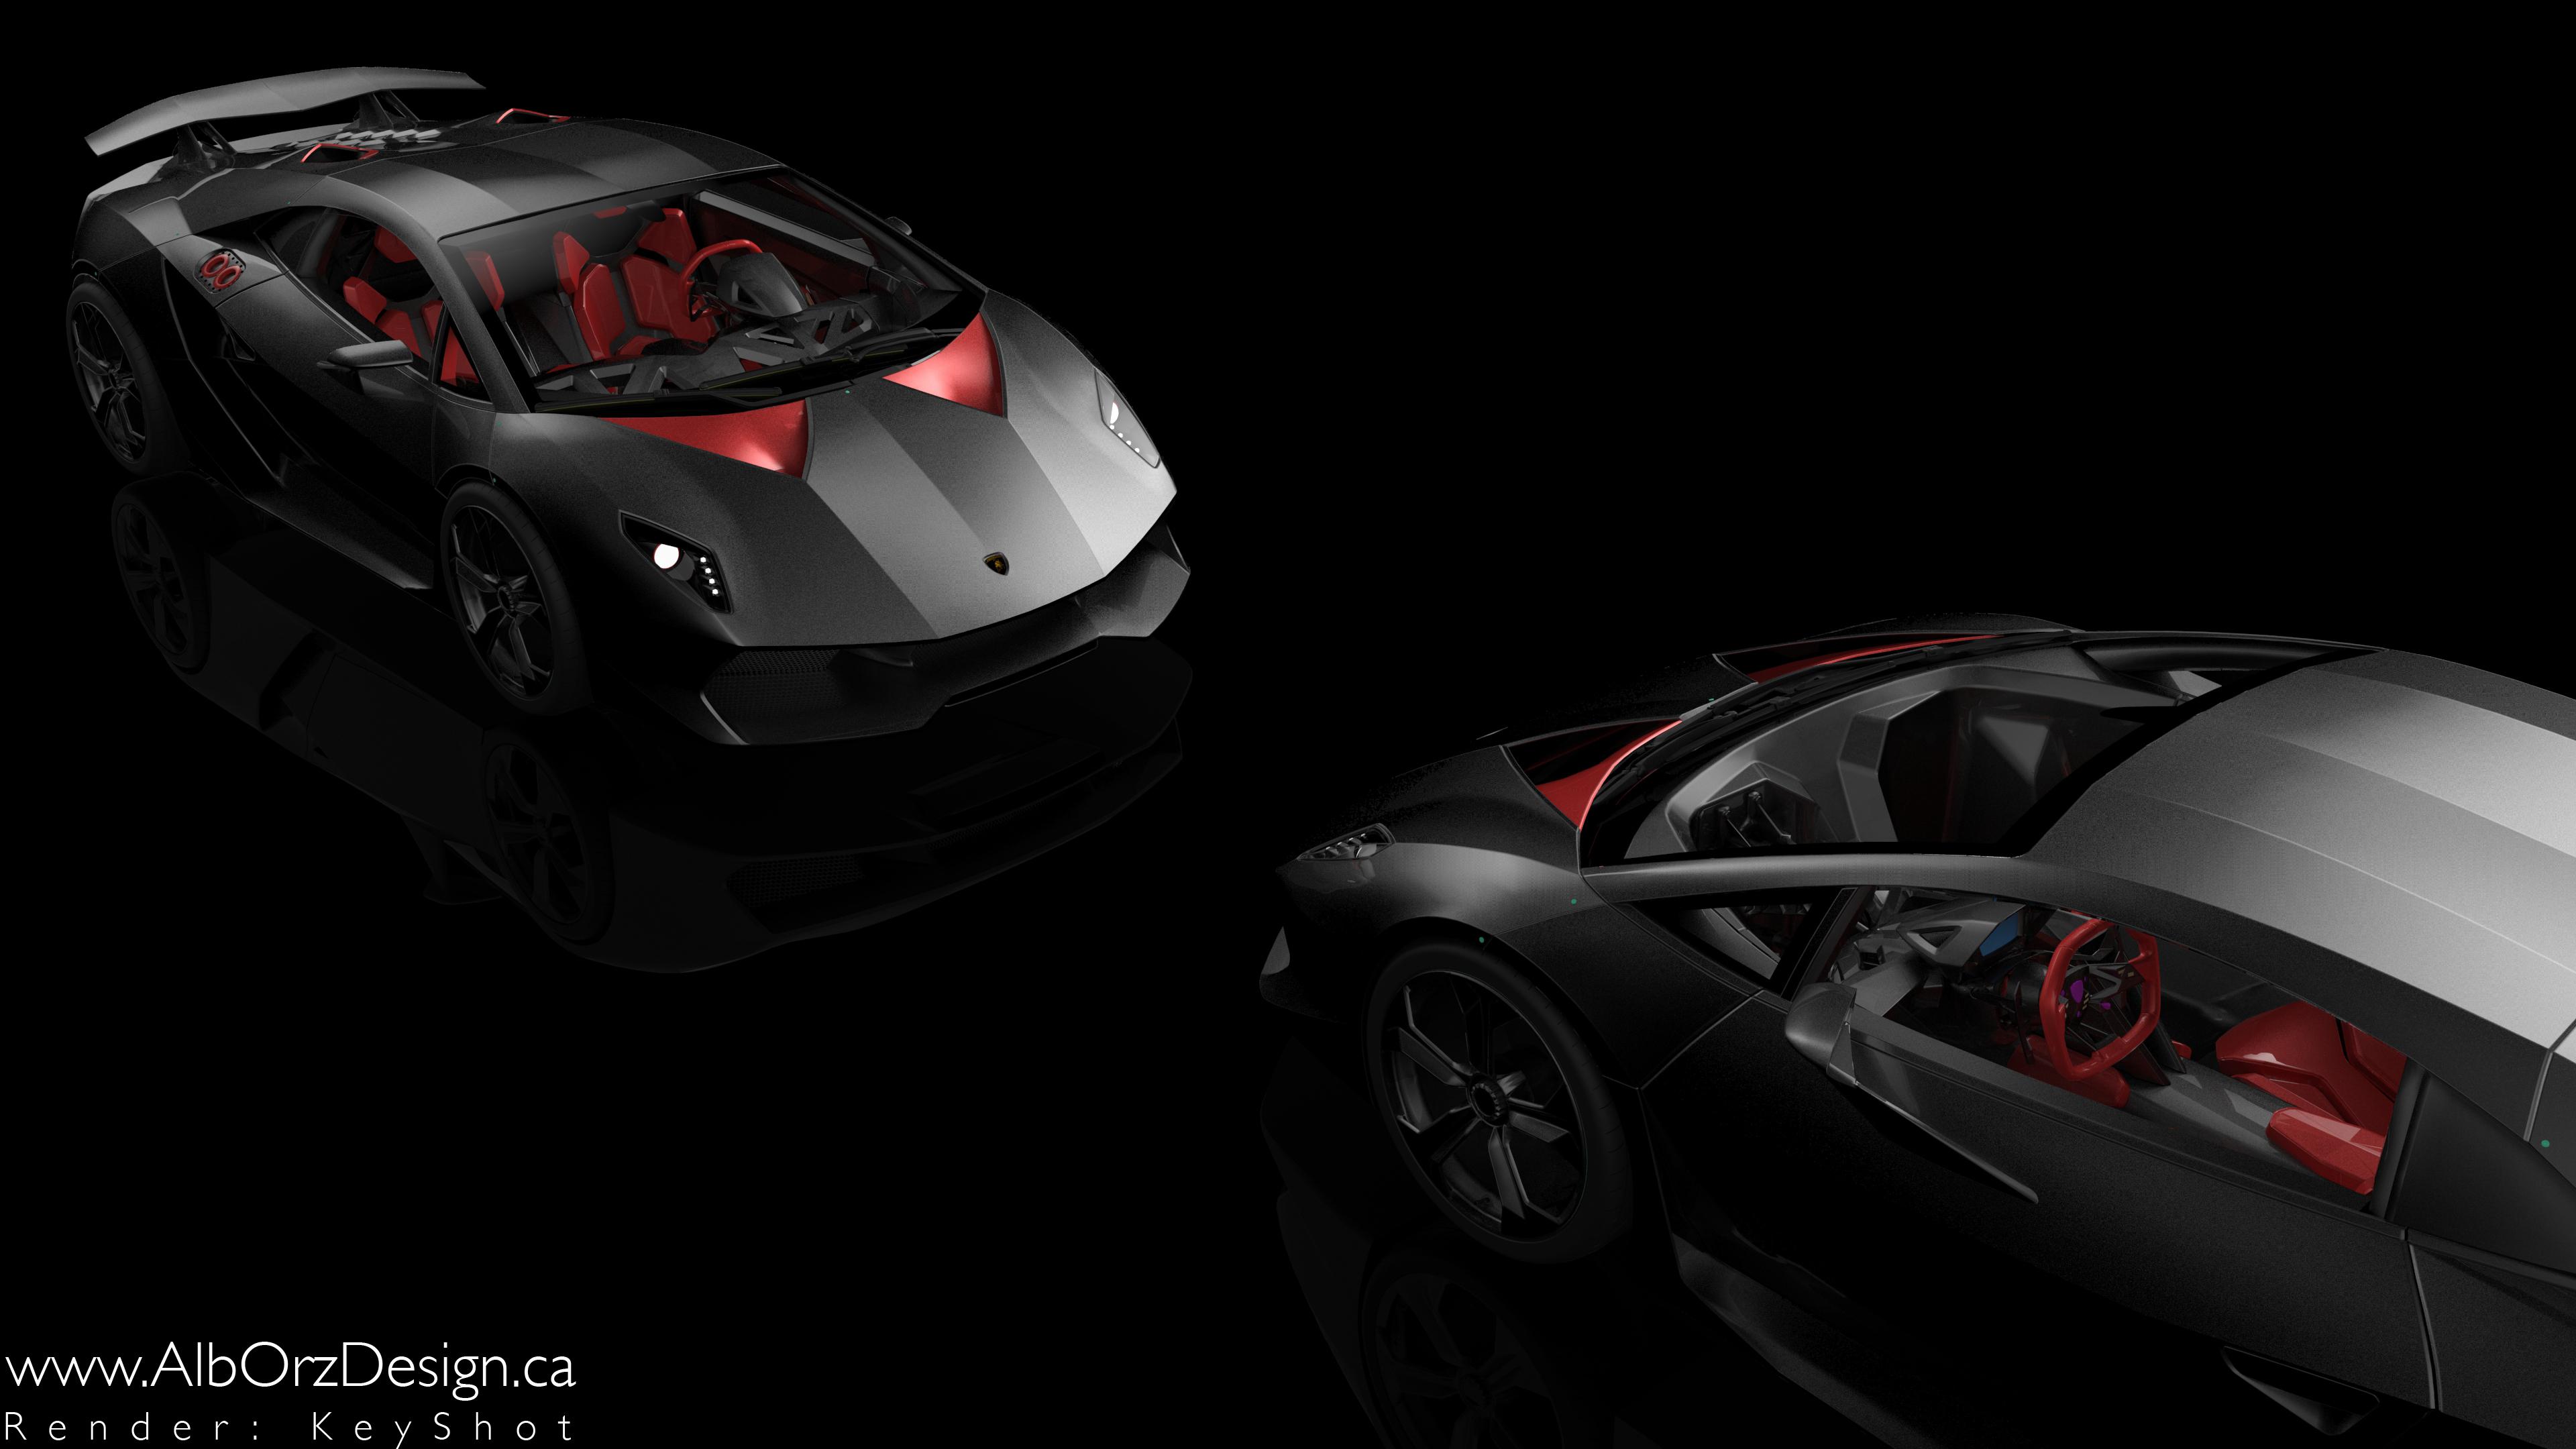 WallpaperUniversitycom 2 Black Lamborghini Sesto 4K Wallpaper 3840x2160